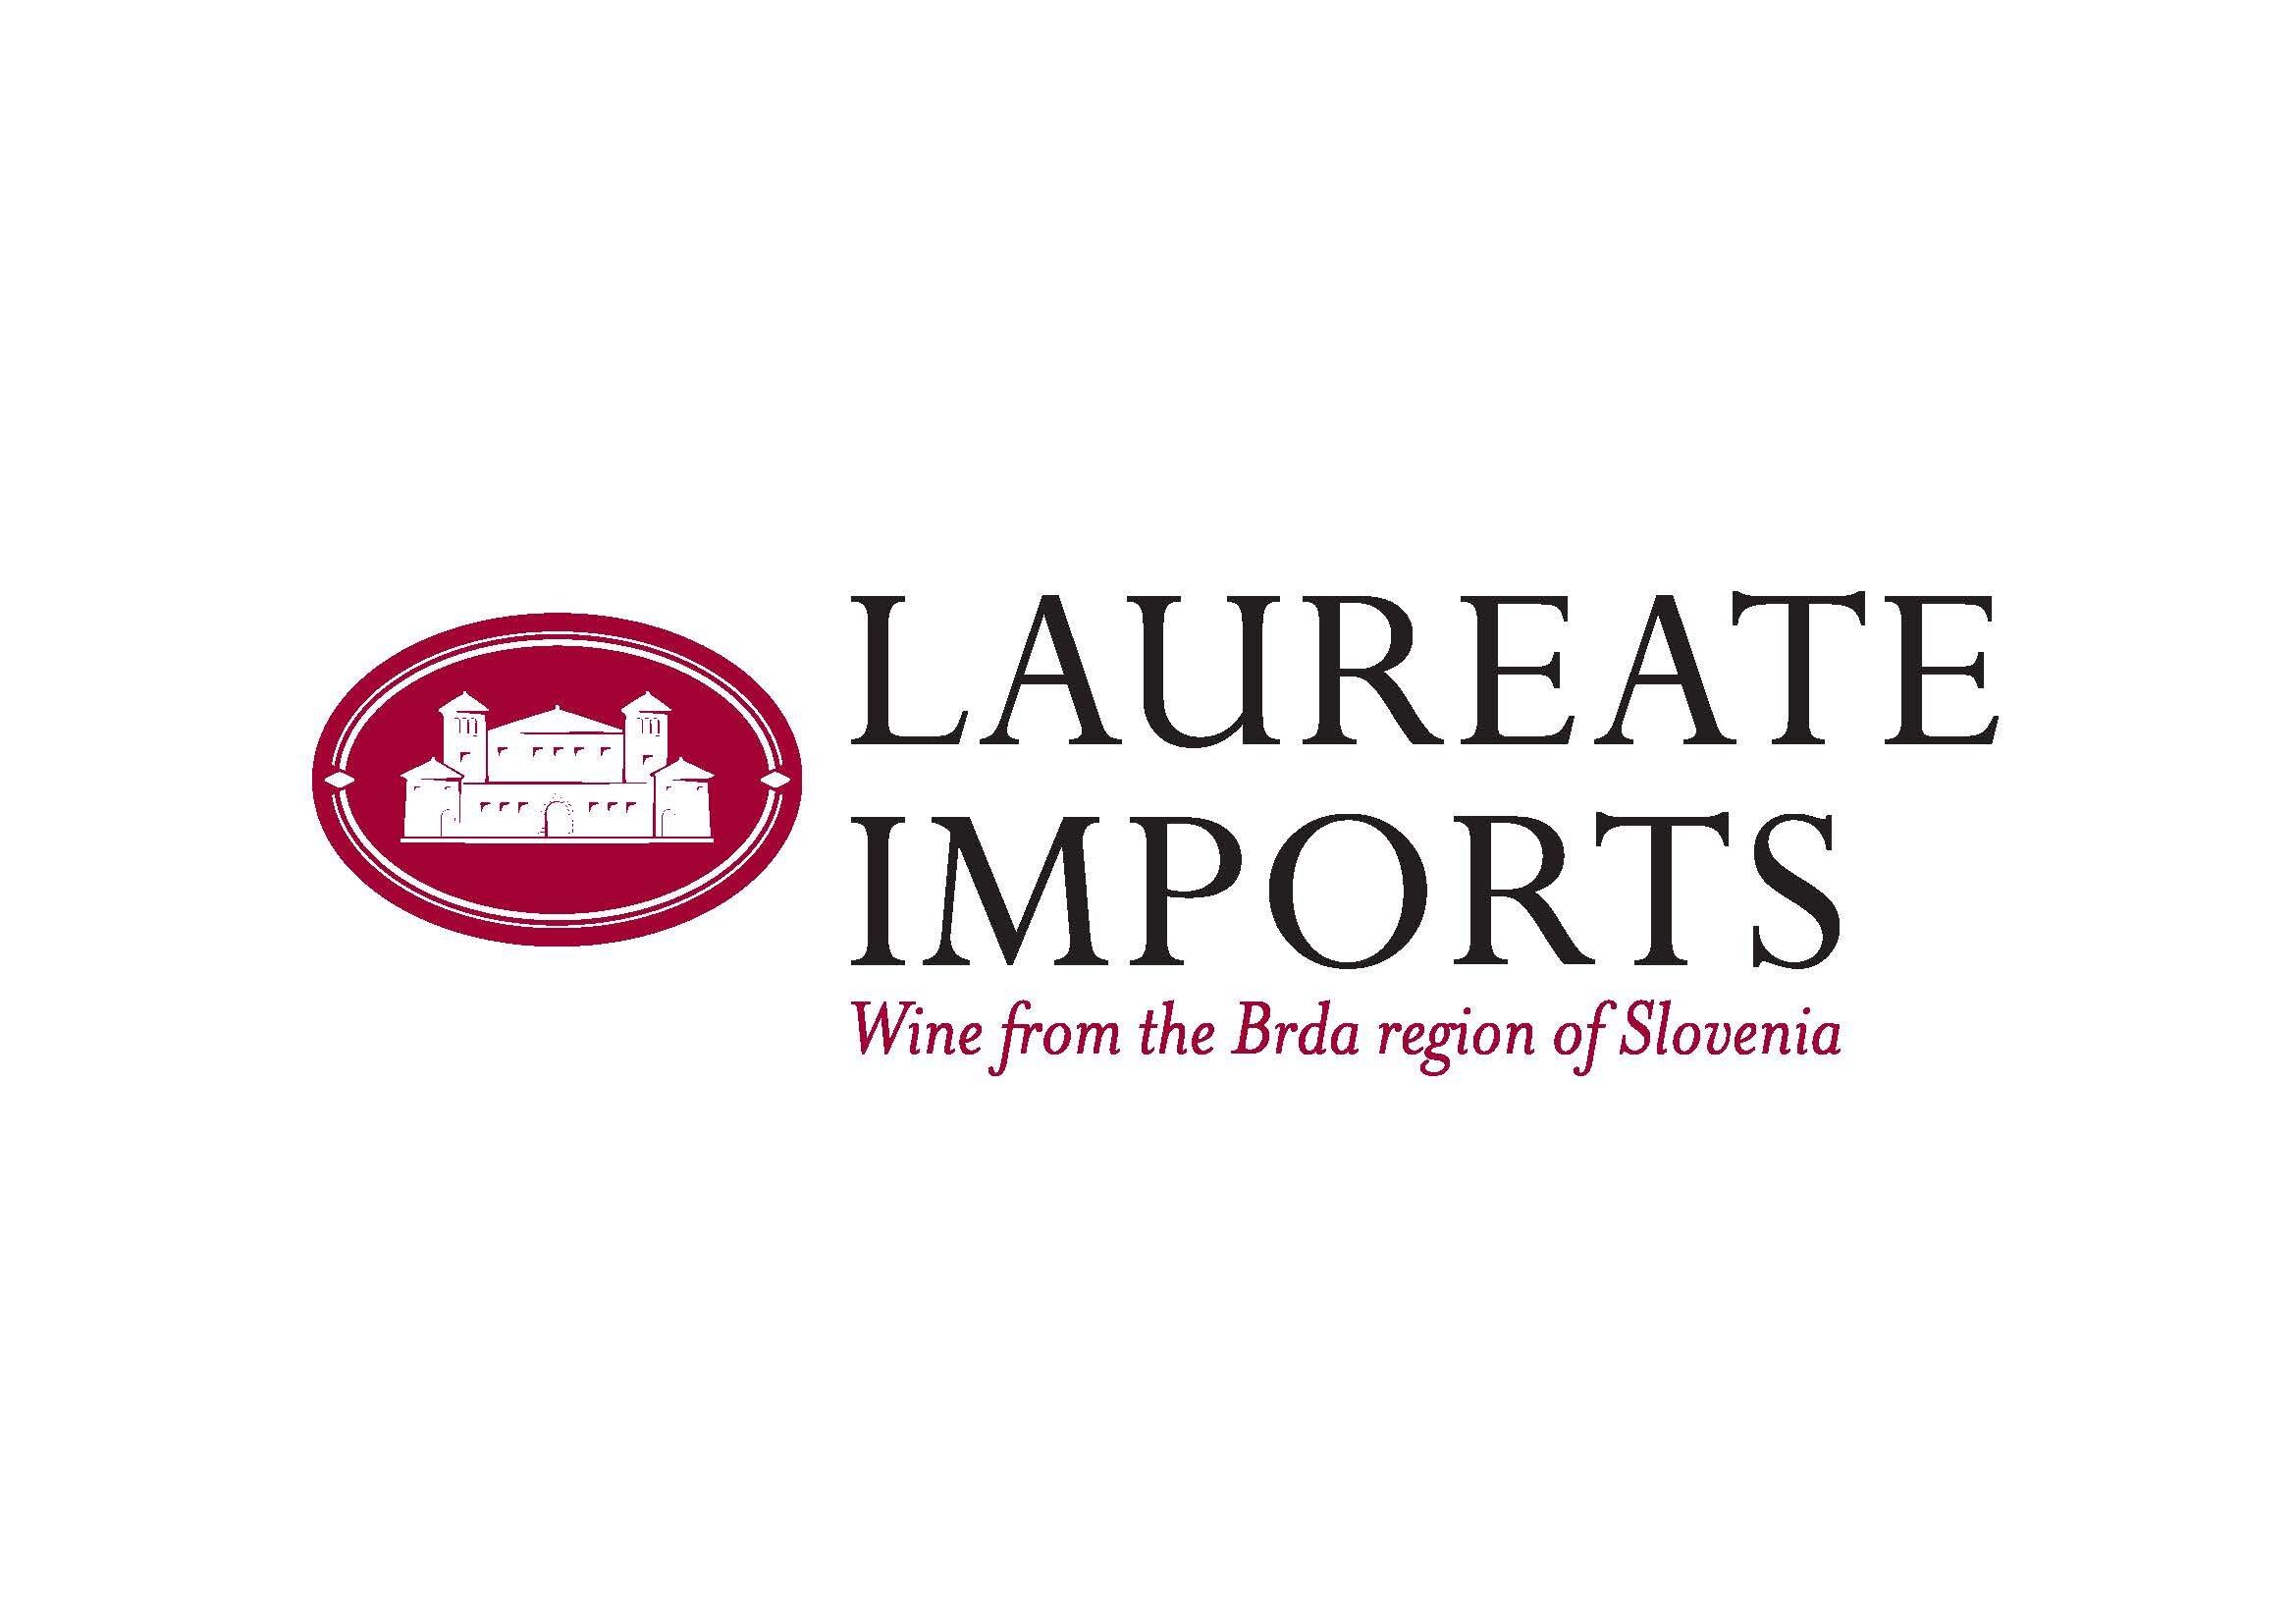 laureate imports.jpg